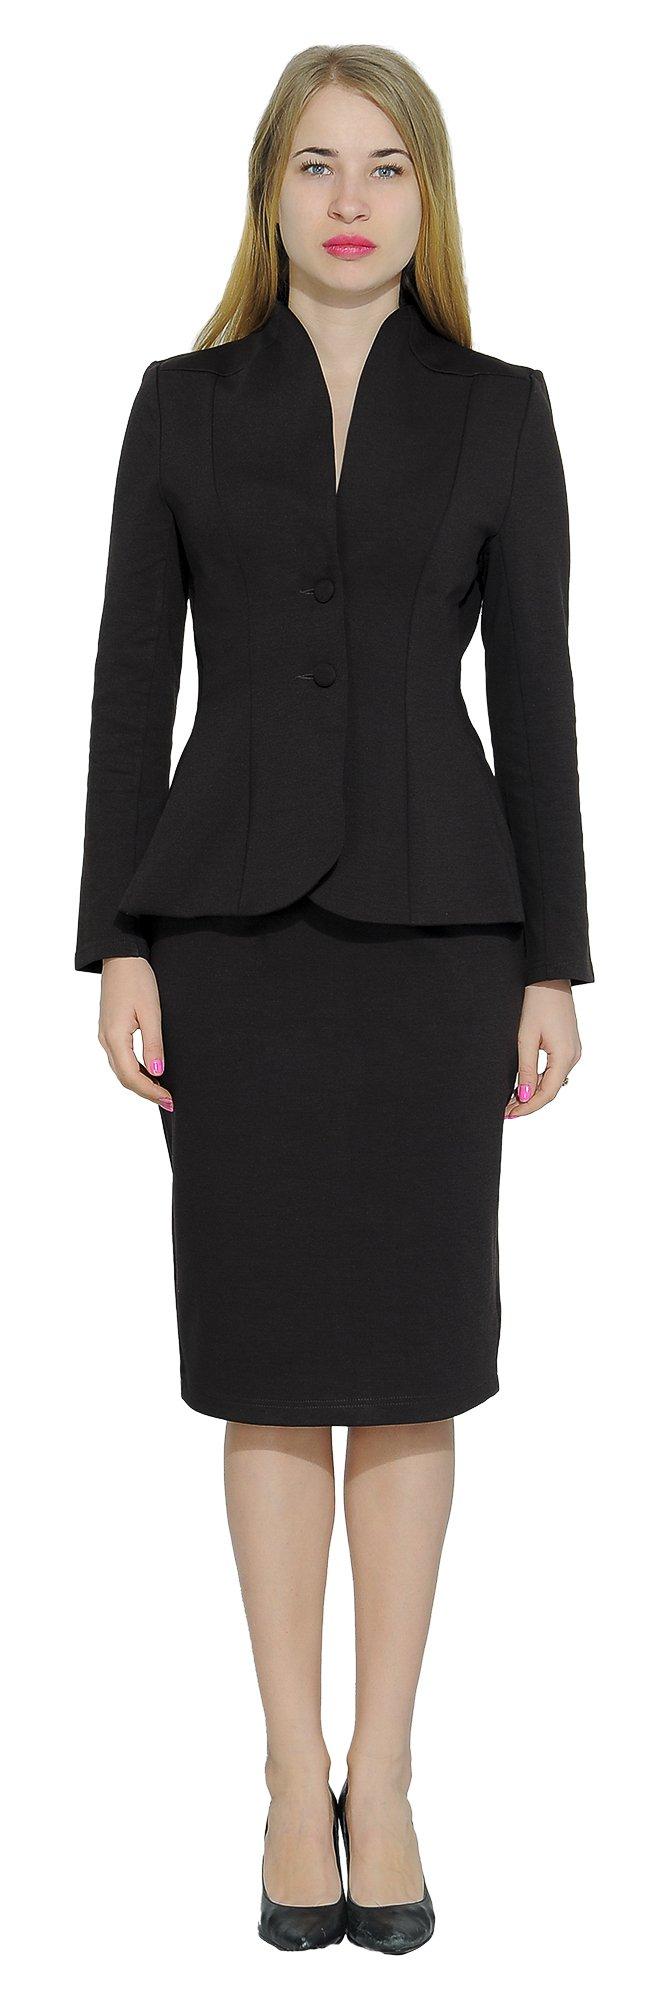 Marycrafts Women's Formal Office Business Work Jacket Skirt Suit Set 2 Black